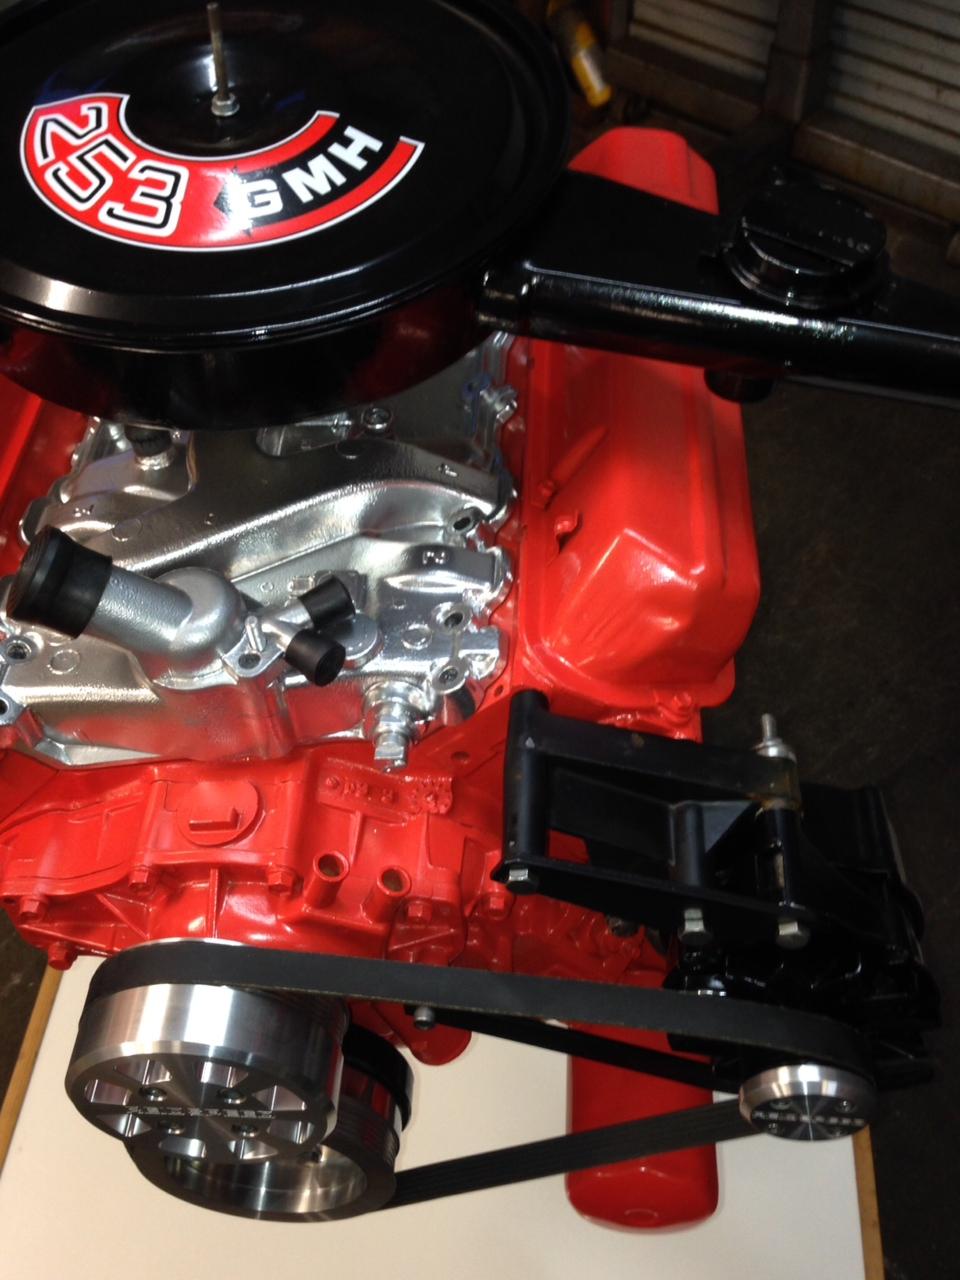 Reidspeed 187 Holden V8 Water Pump And Alternator High Mount